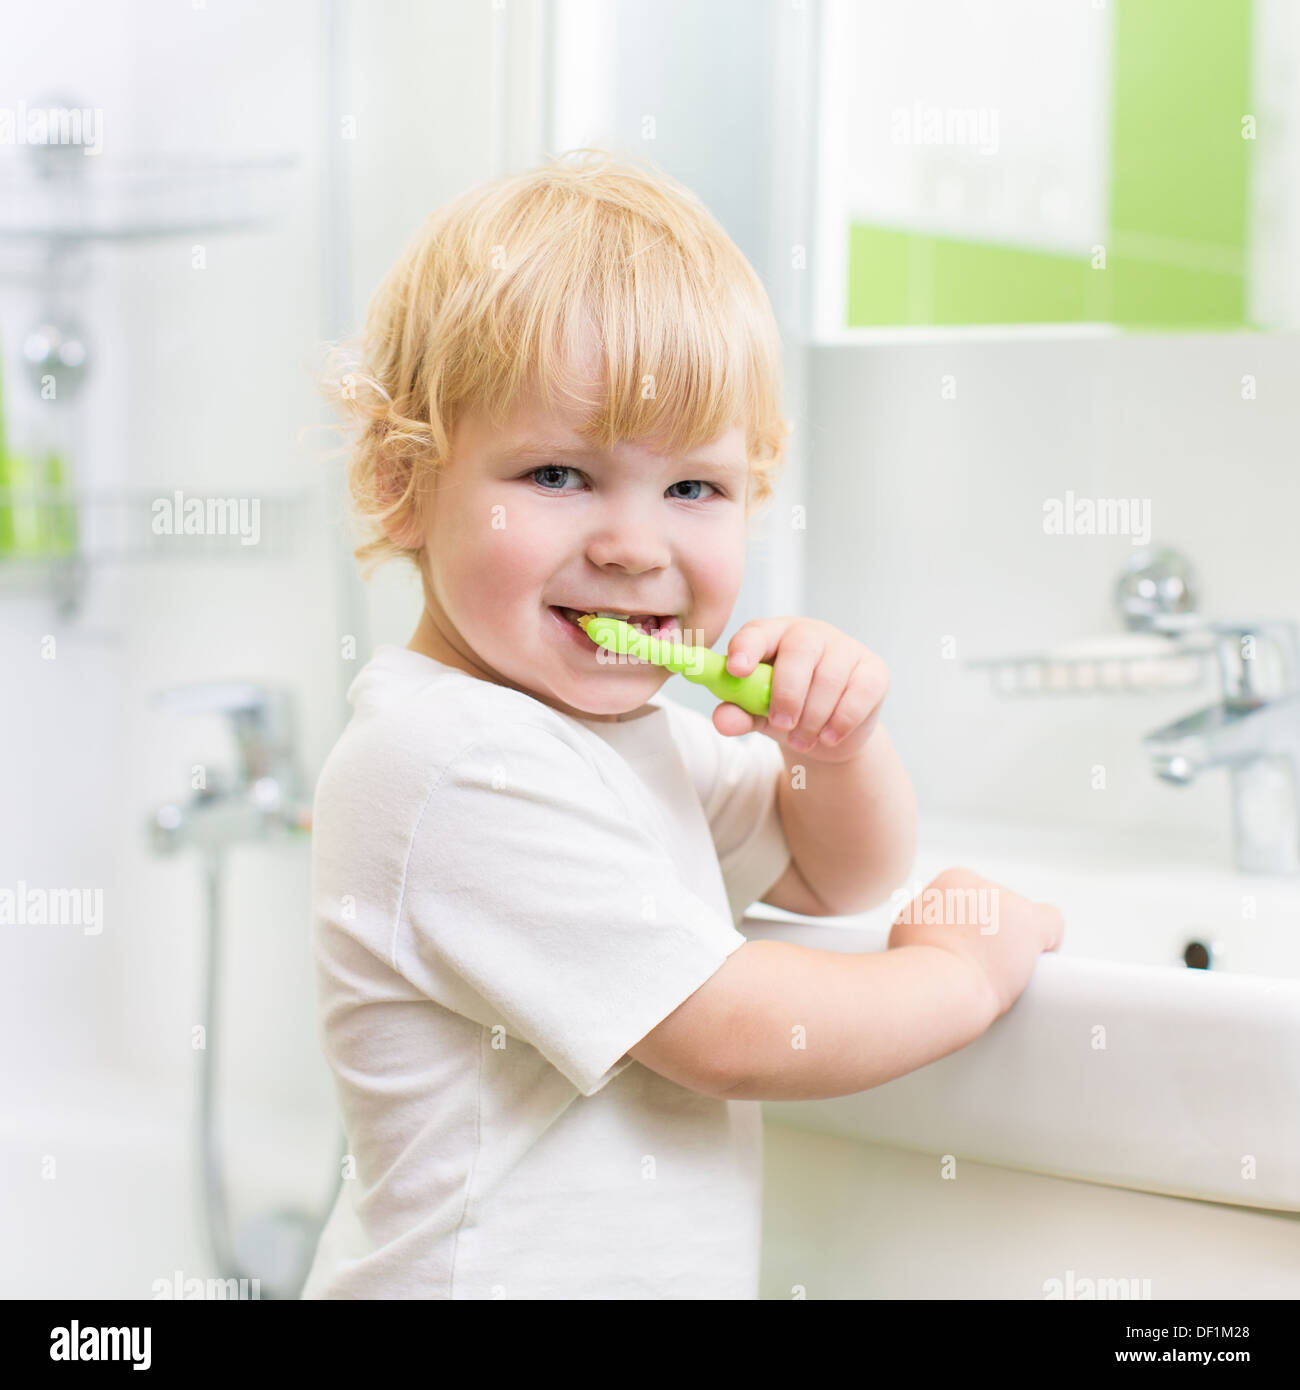 Kid boy brushing teeth in bathroom - Stock Image